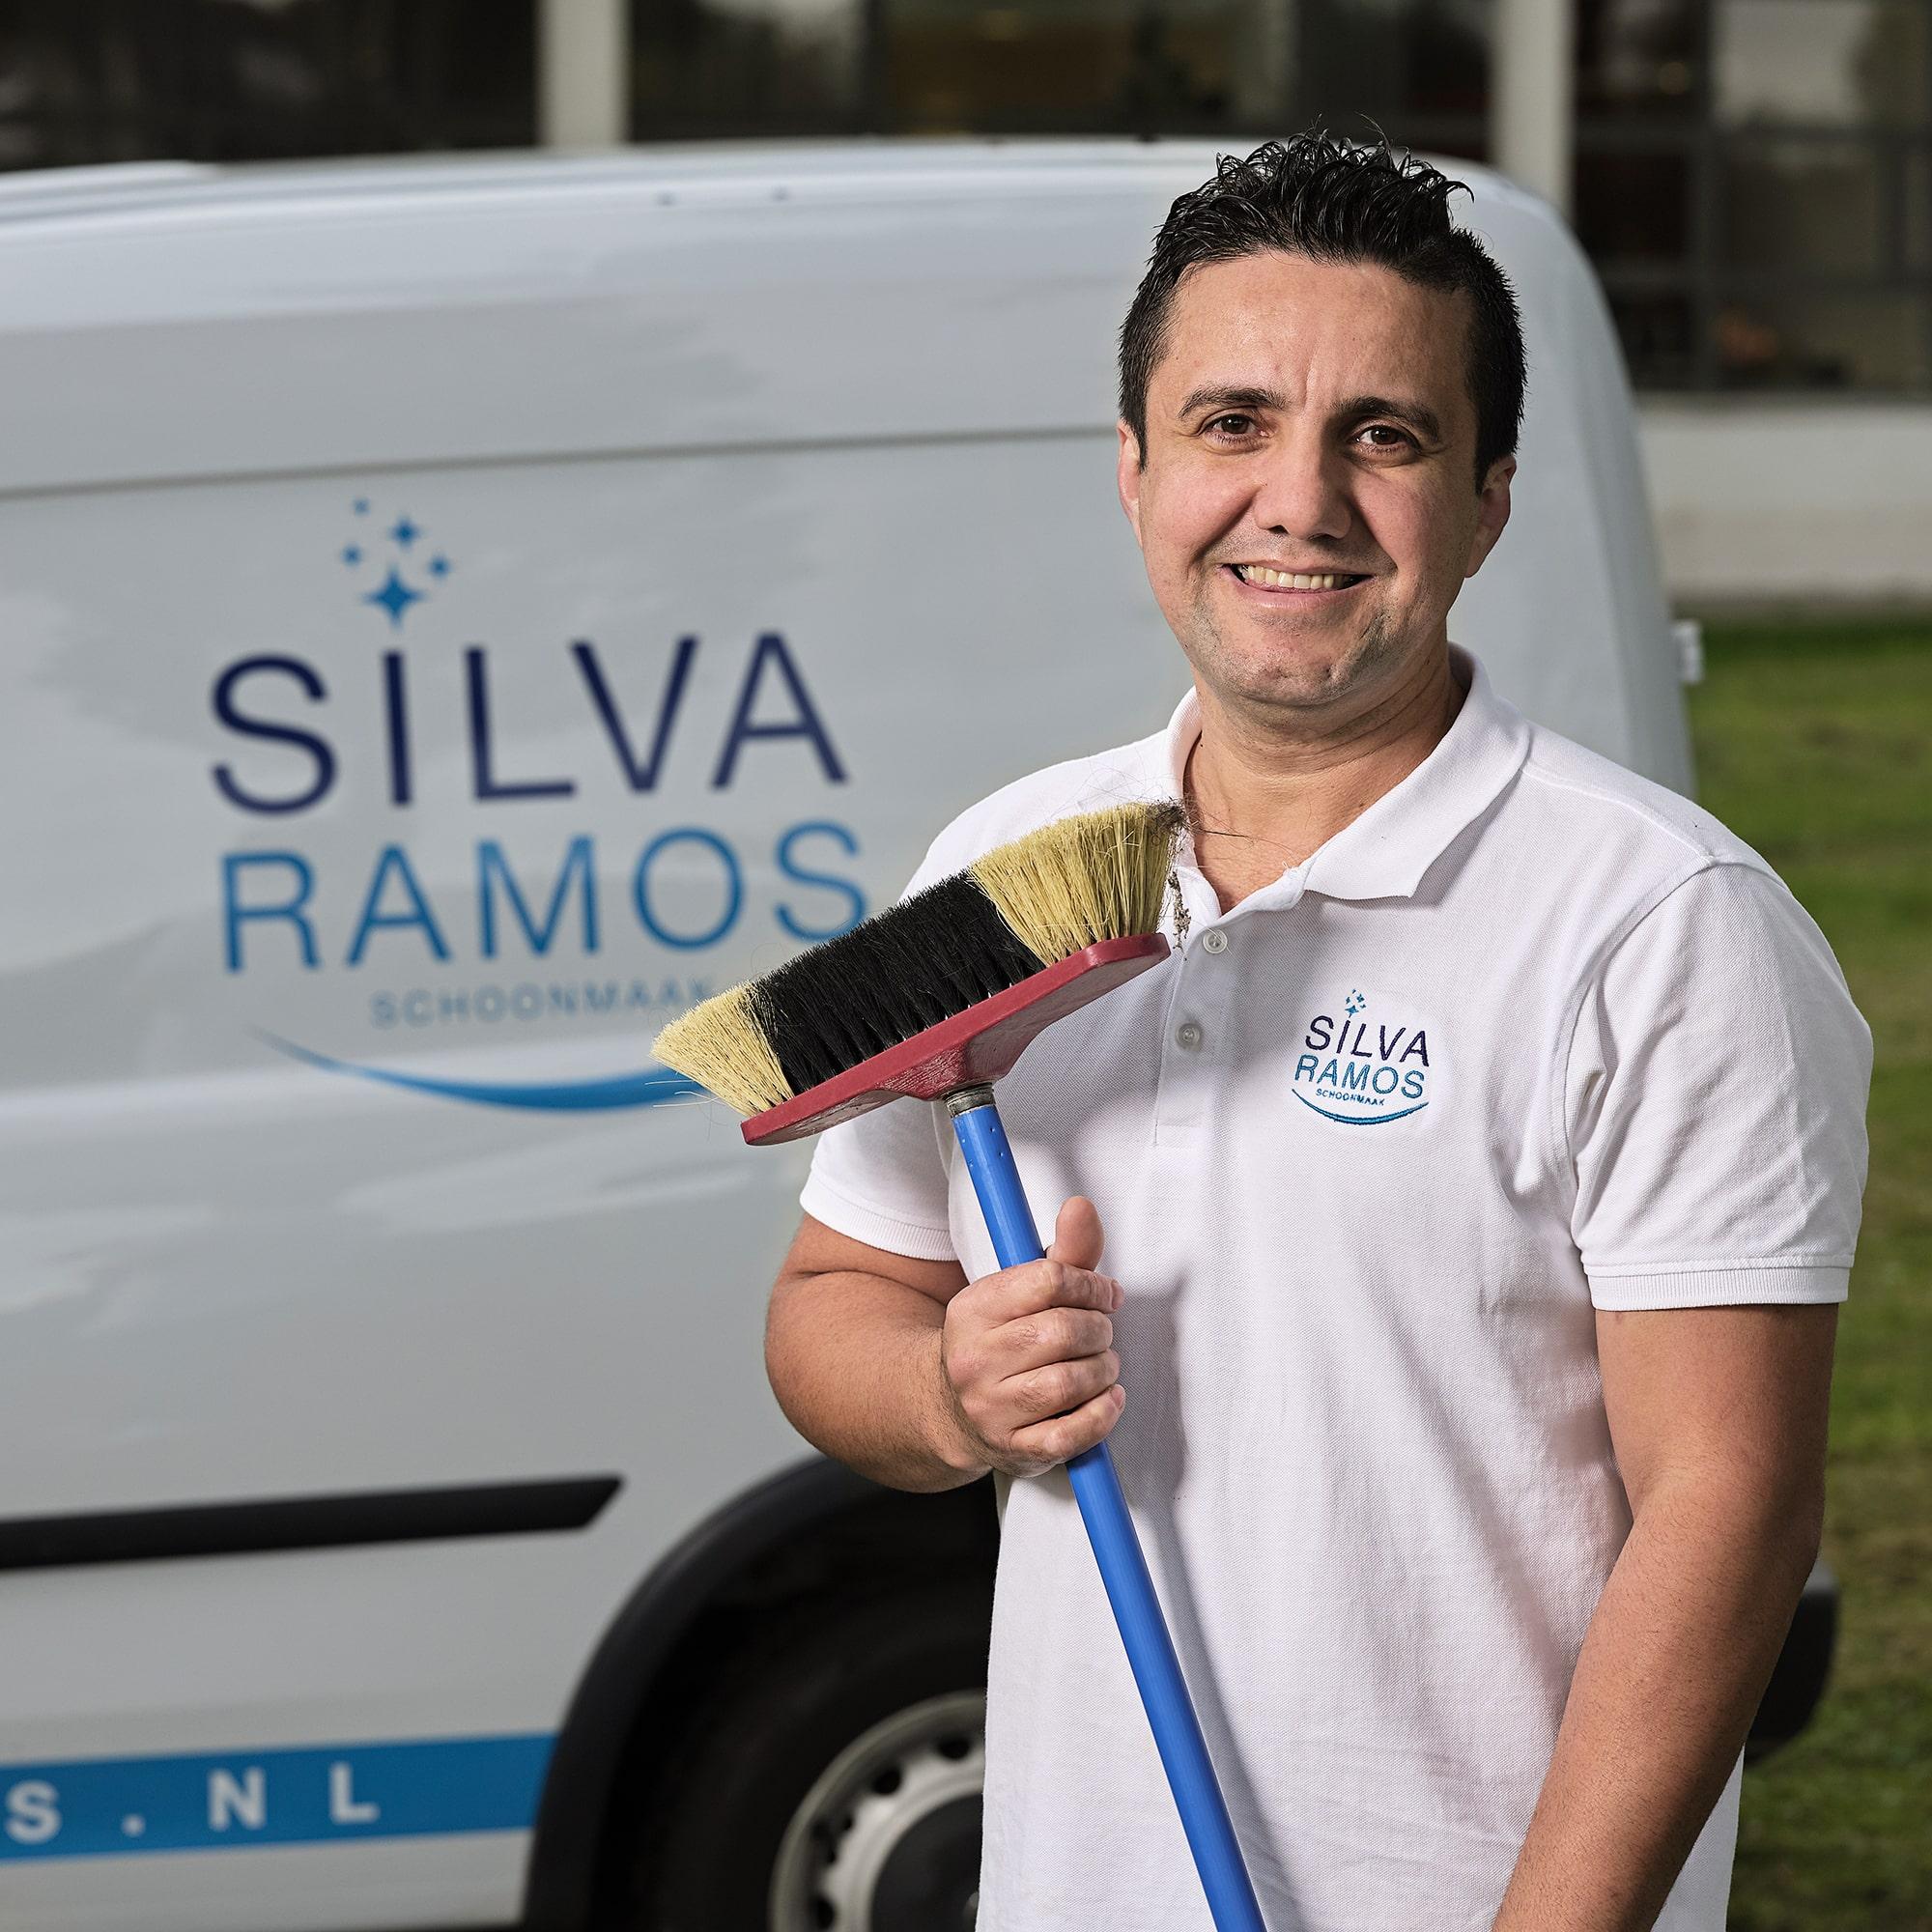 Janildo Silva